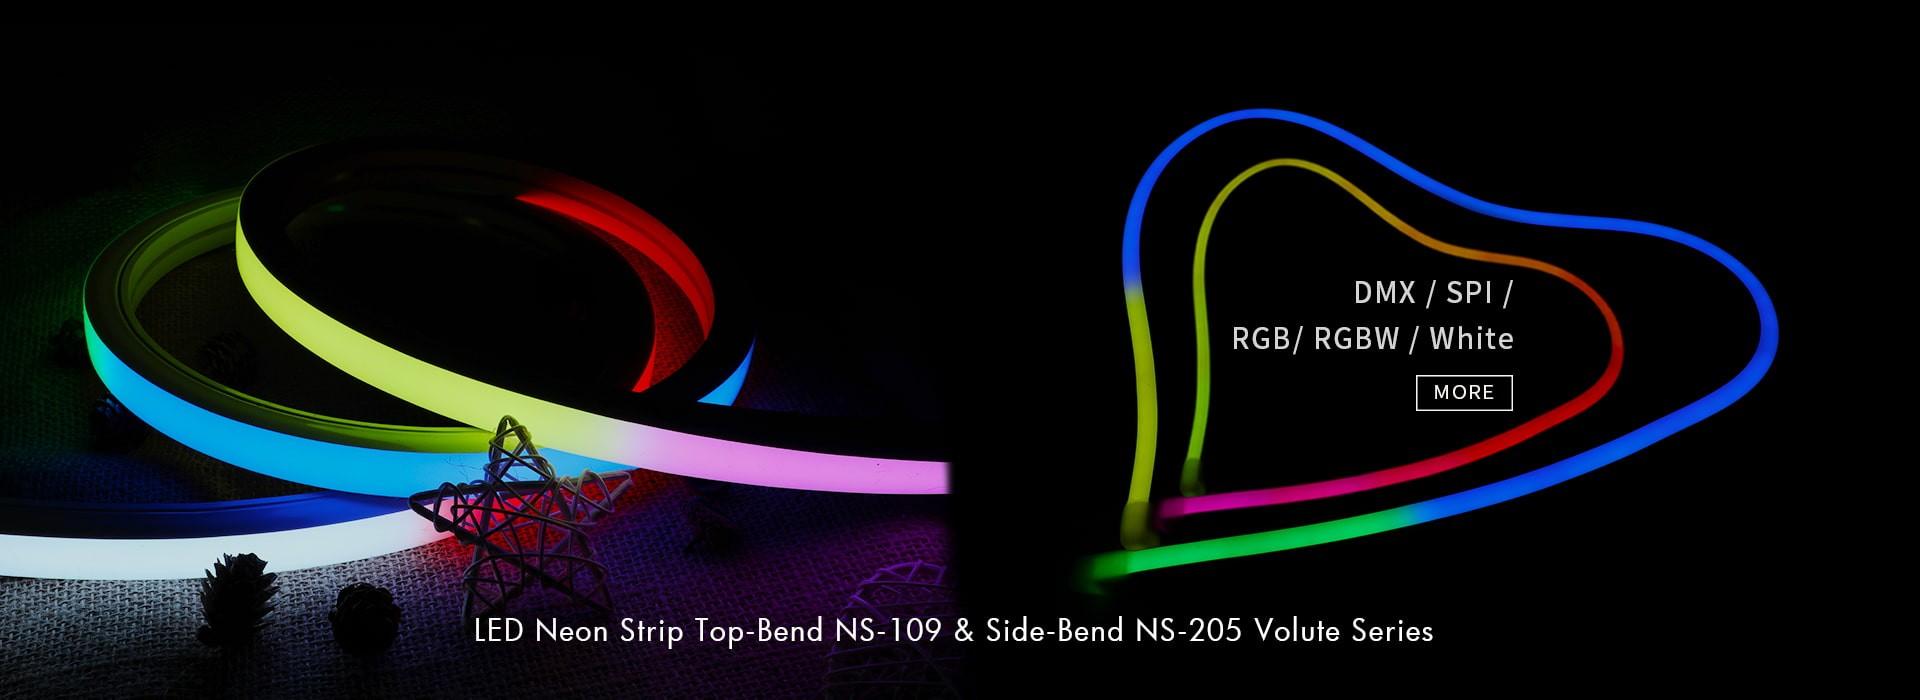 LED霓虹灯条上弯NS-109和侧弯NS-205蜗壳系列